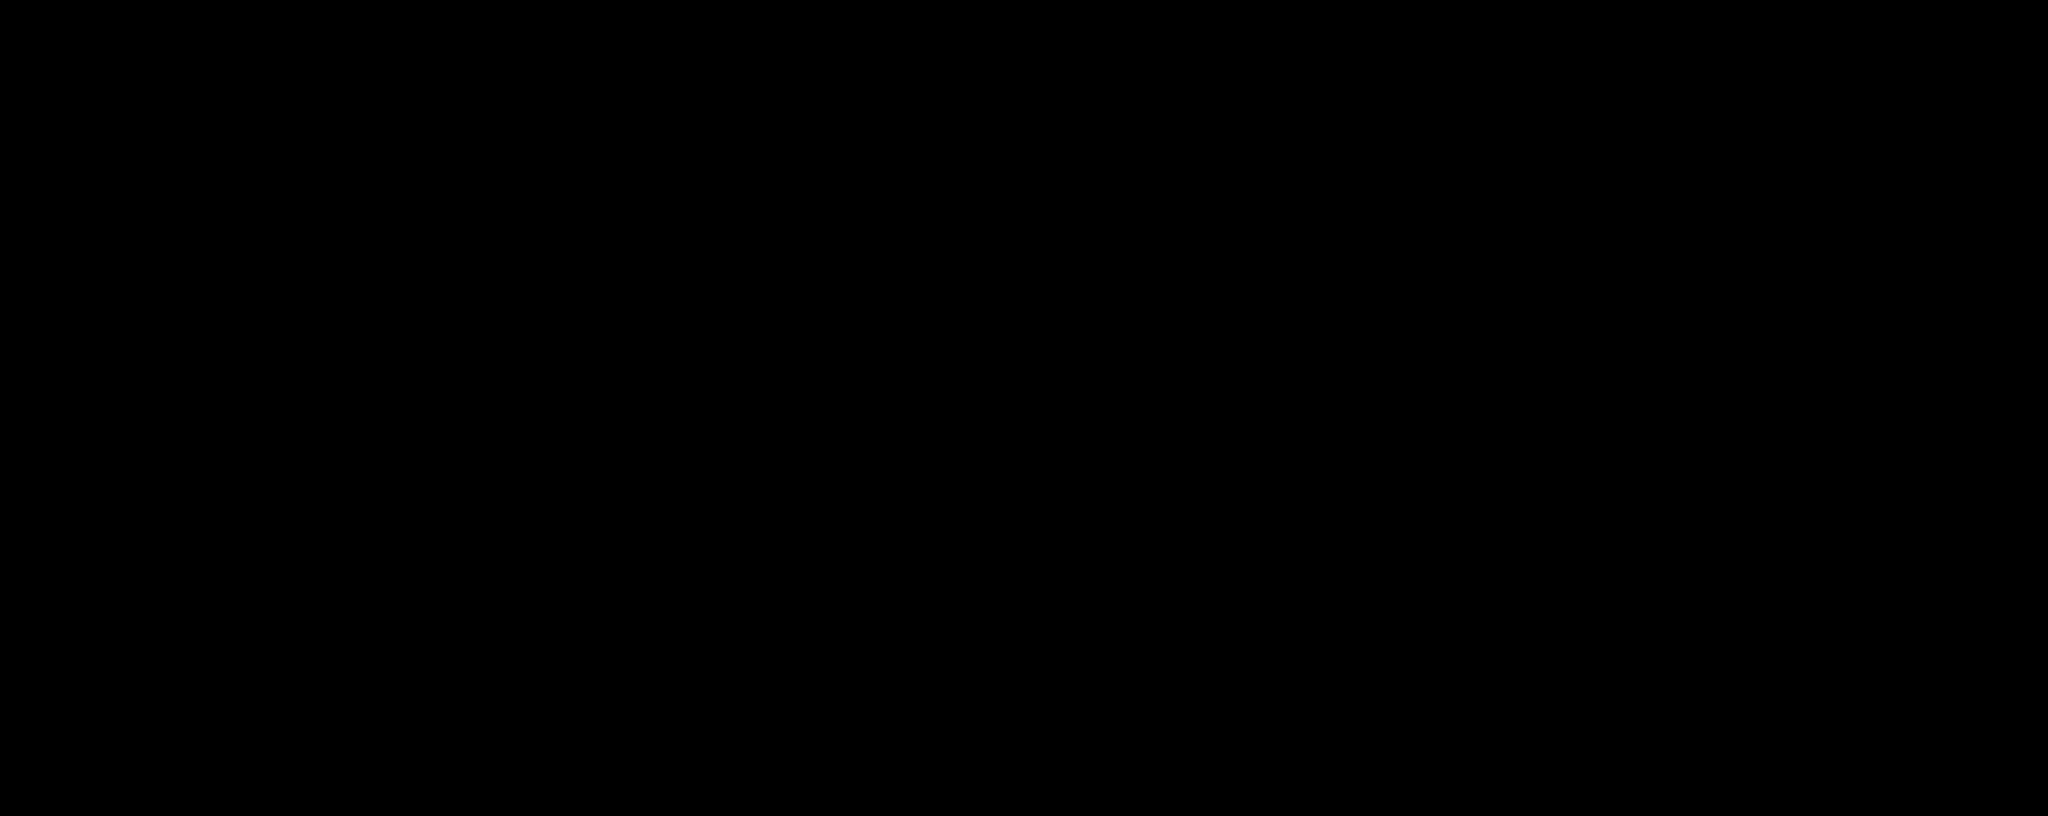 https://themonaco.com.au/wp-content/uploads/2020/08/NPA_Logo_RGB_Primary_Mono-2048x816.png